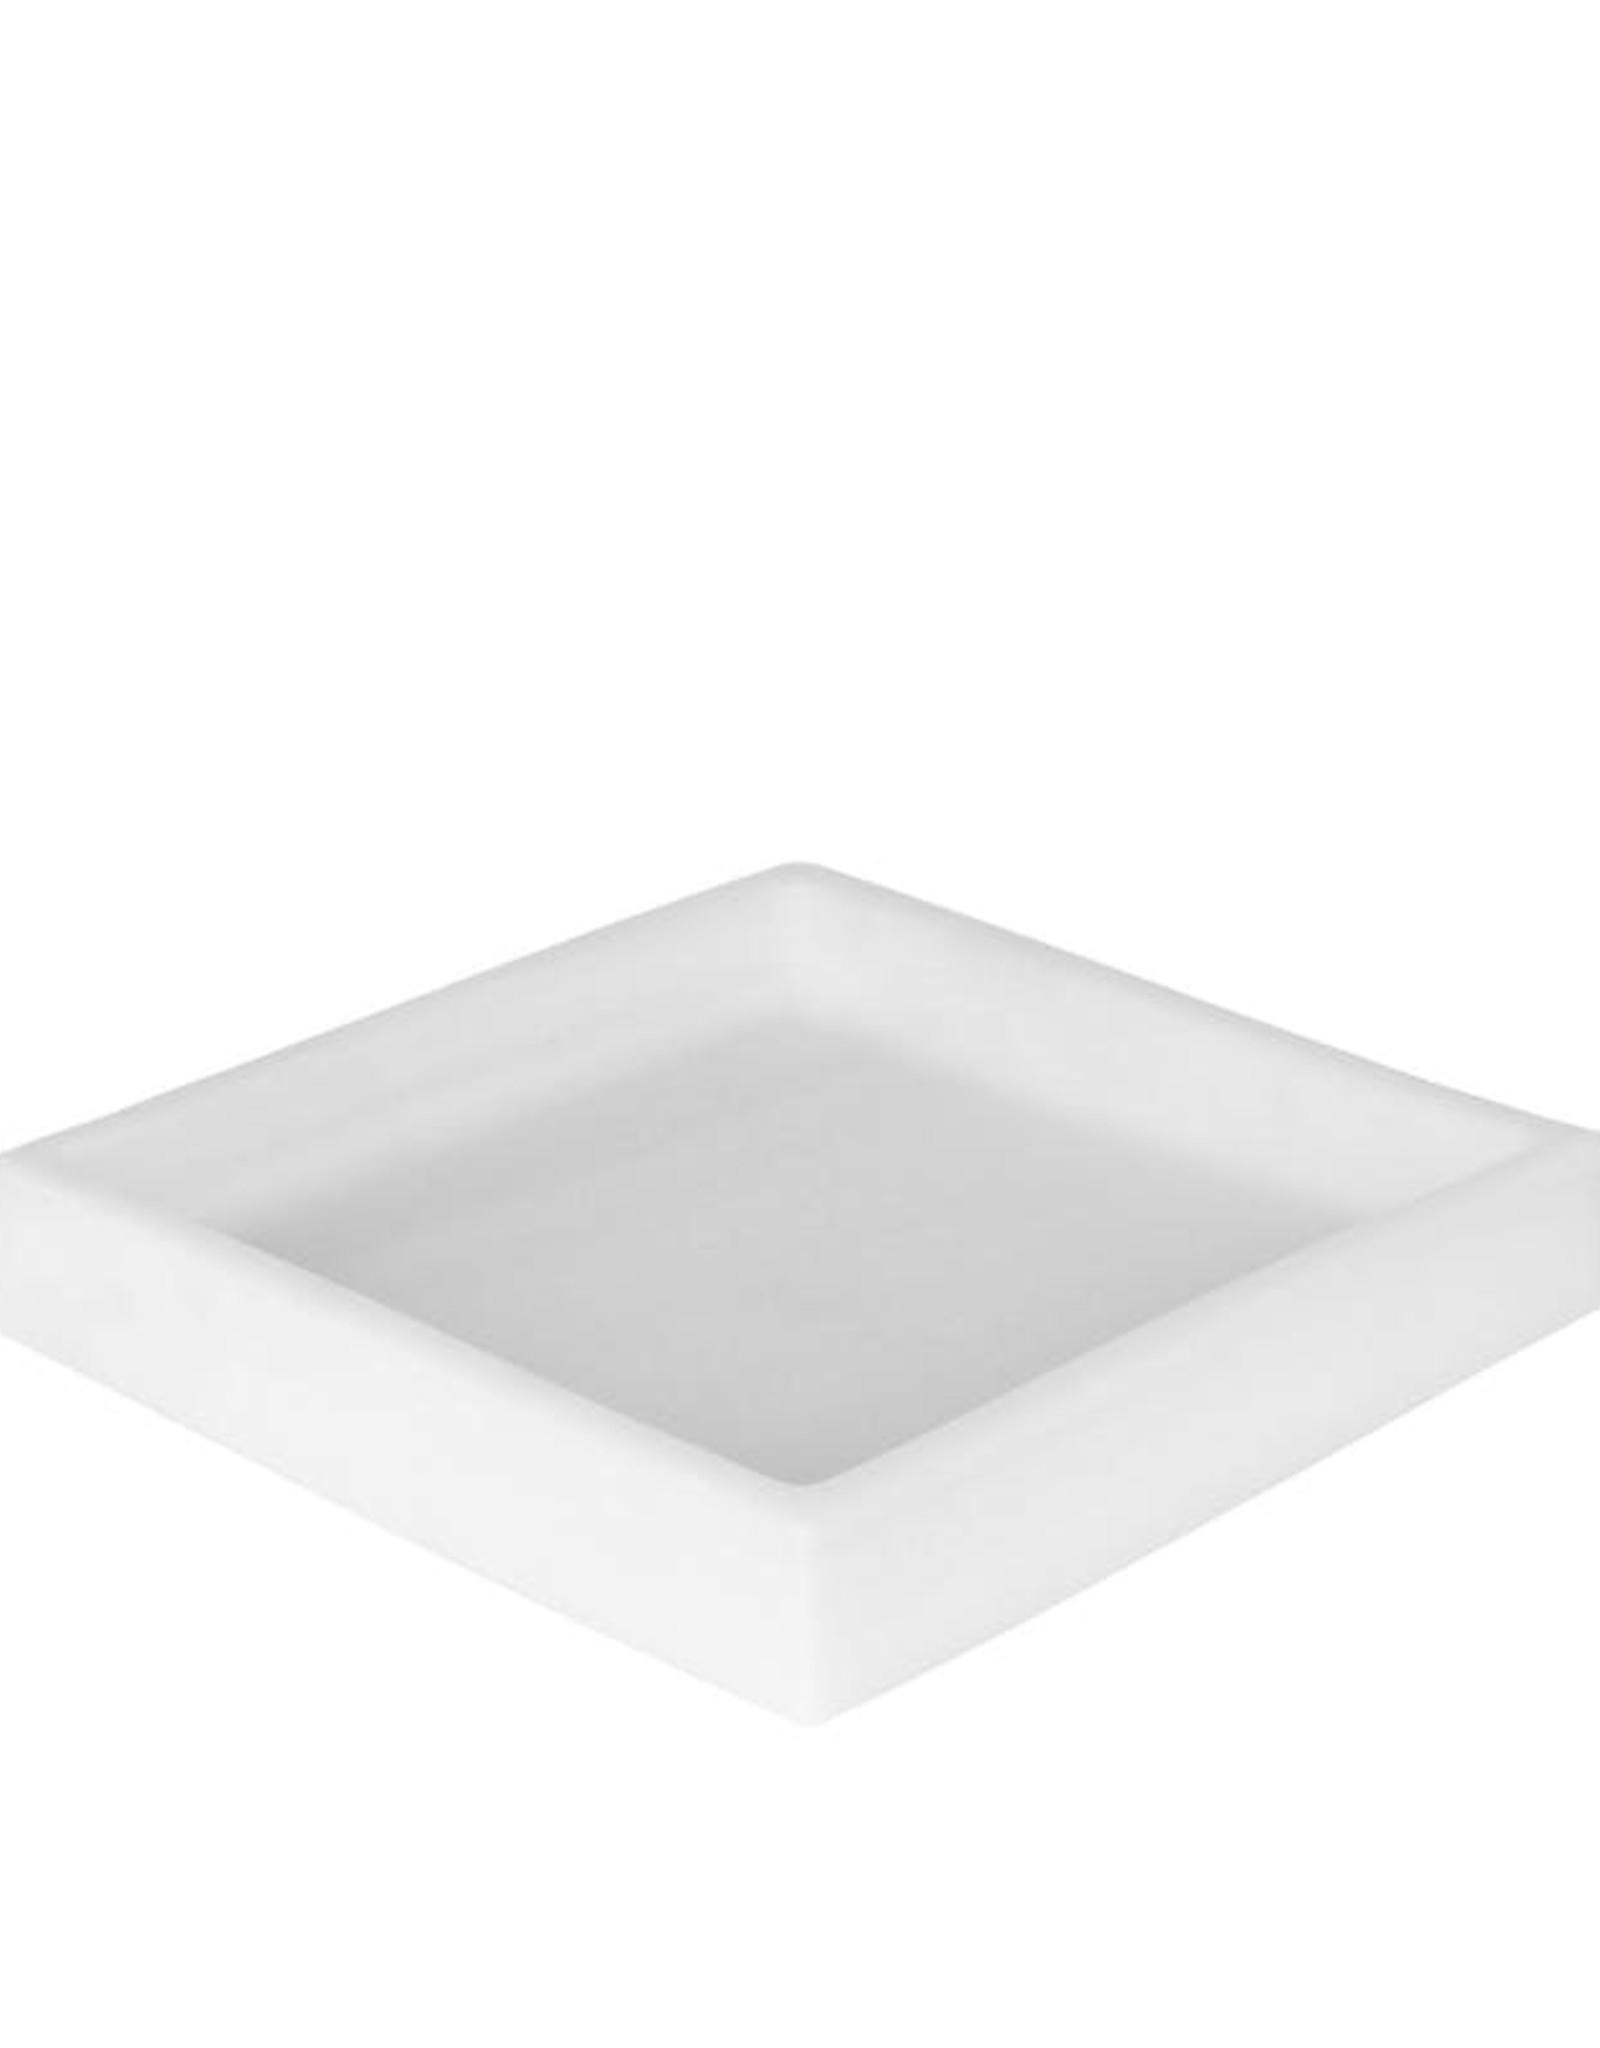 Stoned Stoned - White tray